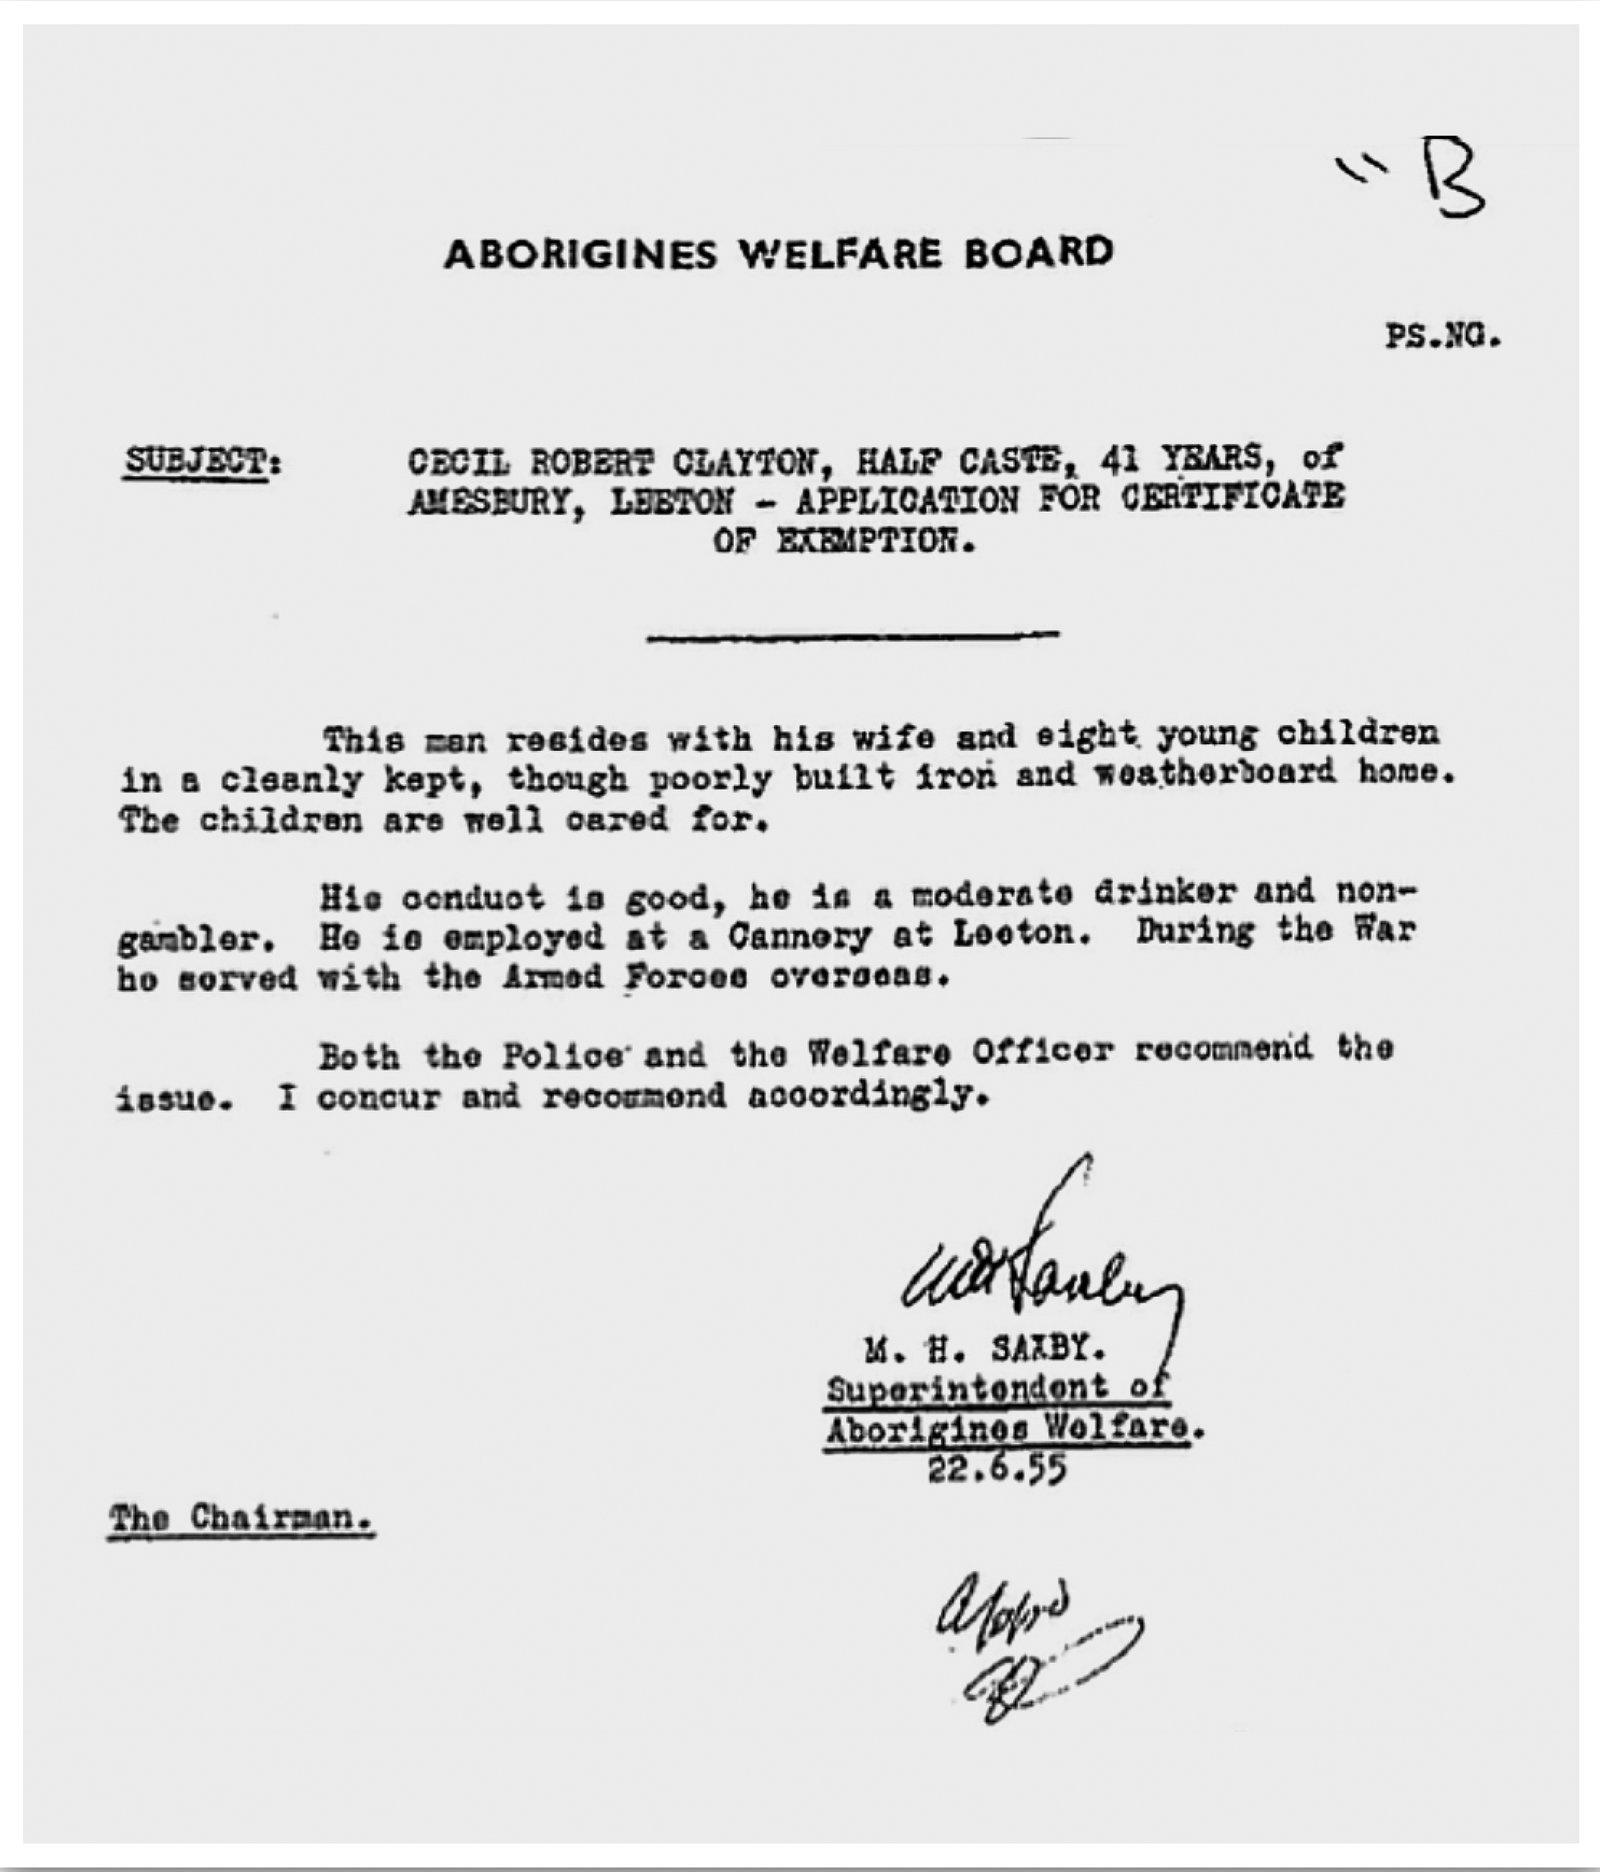 Aborigines Welfare Board Exemption Certificate